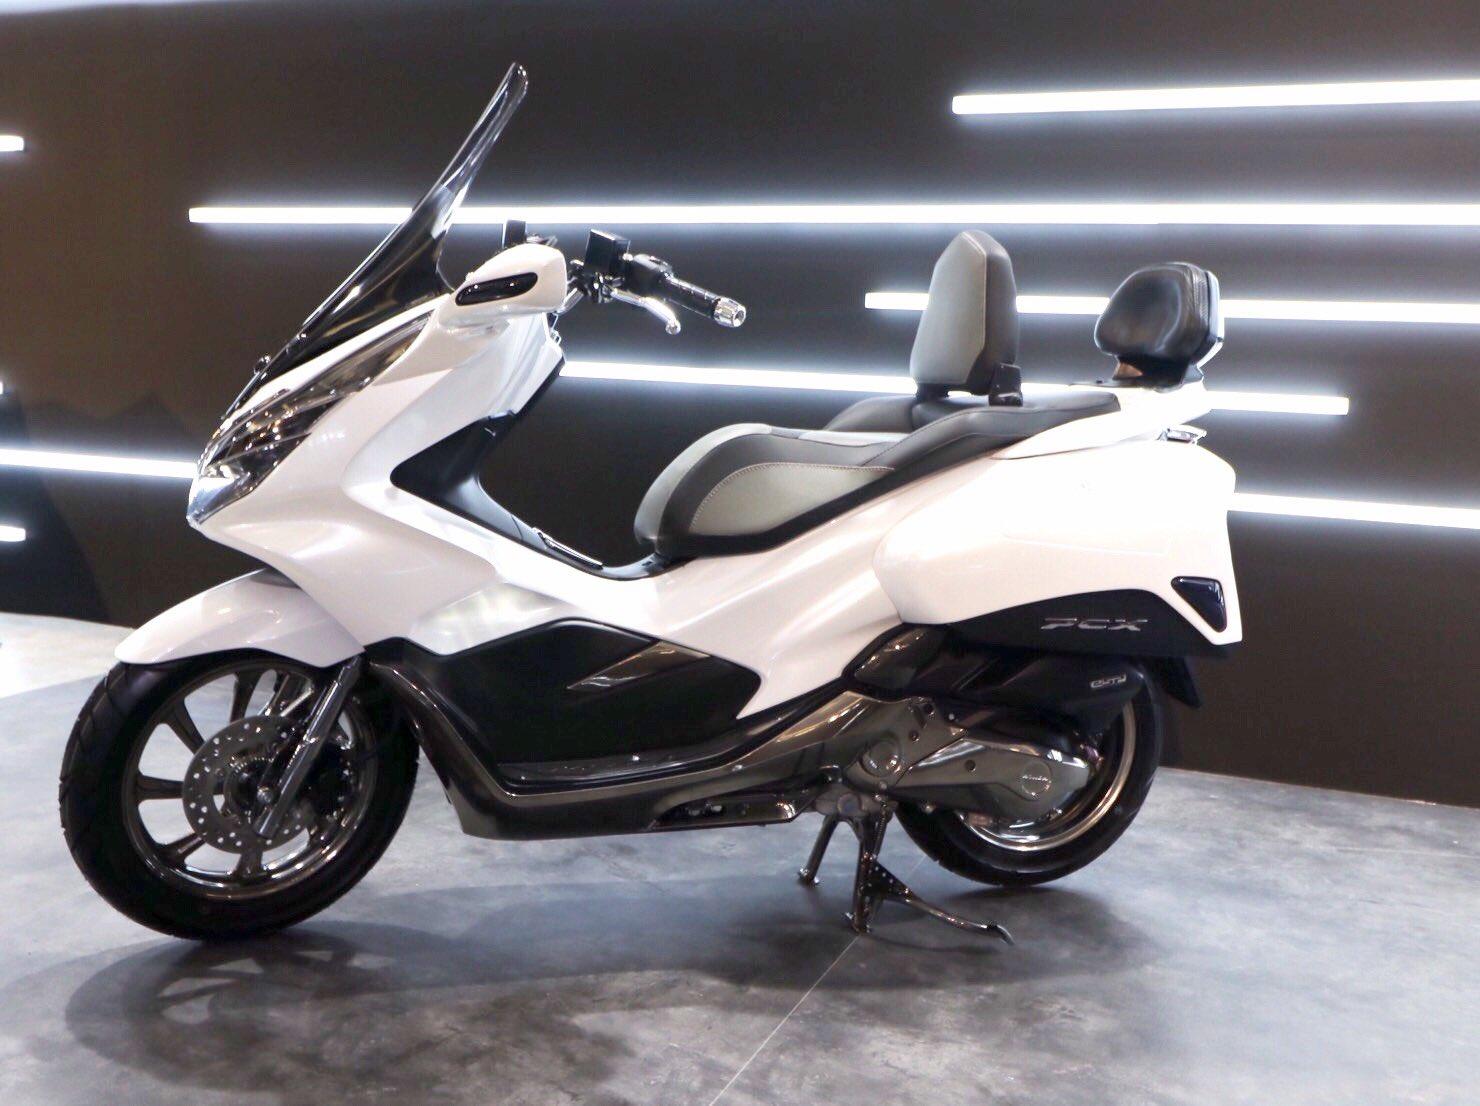 Honda Forza 250 2018 >> Modifikasi Honda PCX 150 Indonesia tahun 2018 versi Exlusive Touring – setia1heri.com